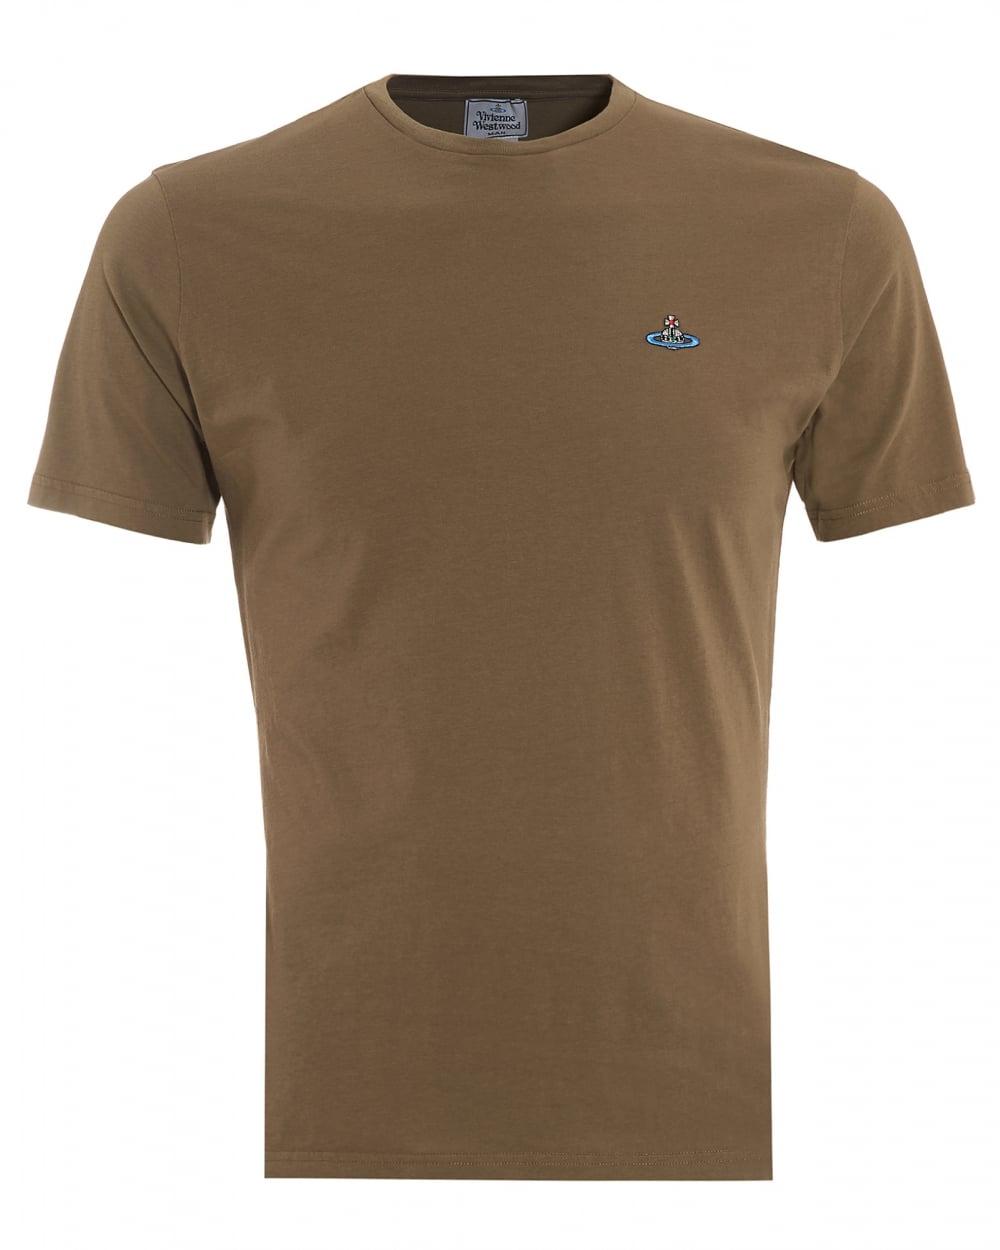 Vivienne westwood man mens t shirt orb logo olive green tee for Green mens t shirt